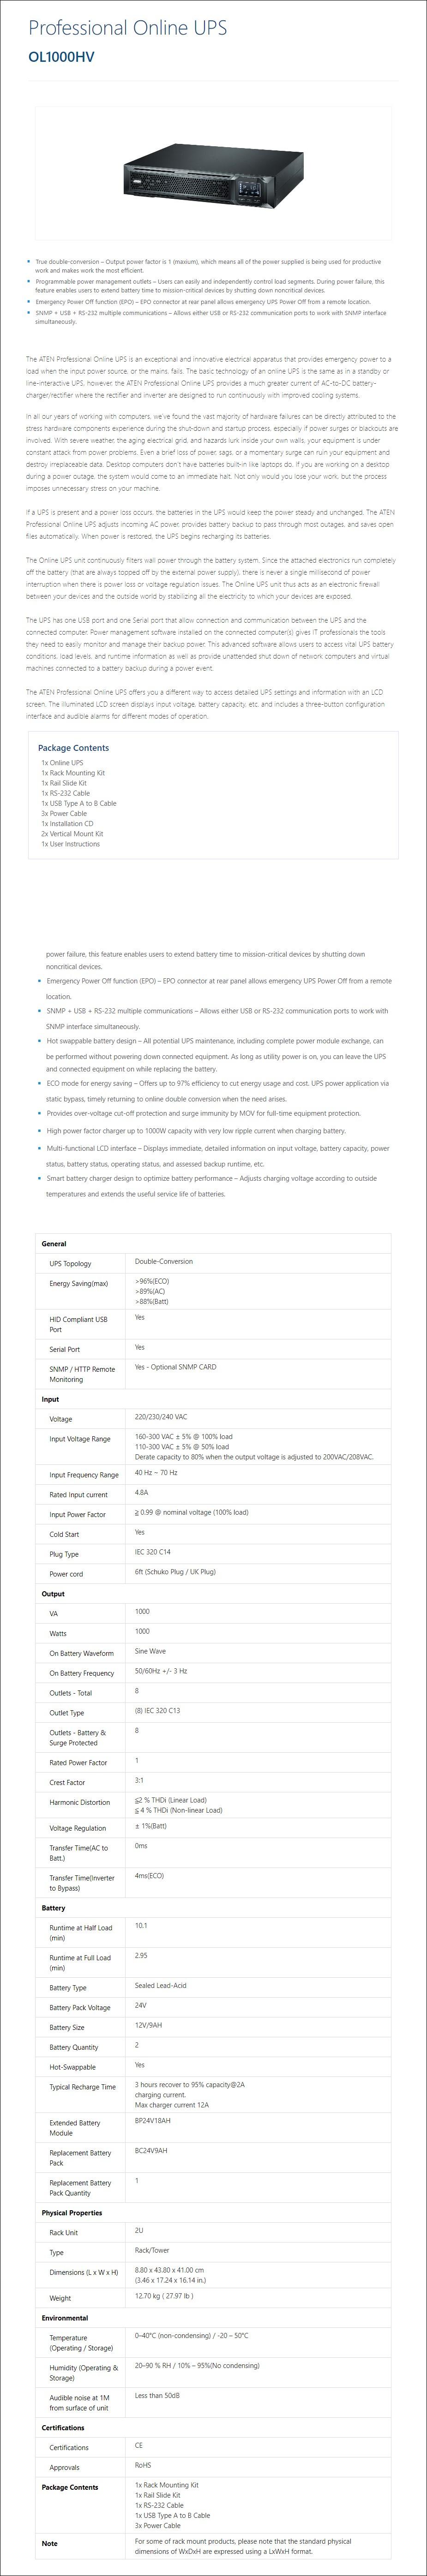 ATEN OL1000HV 1000VA / 1000W Professional Online UPS - Overview 2